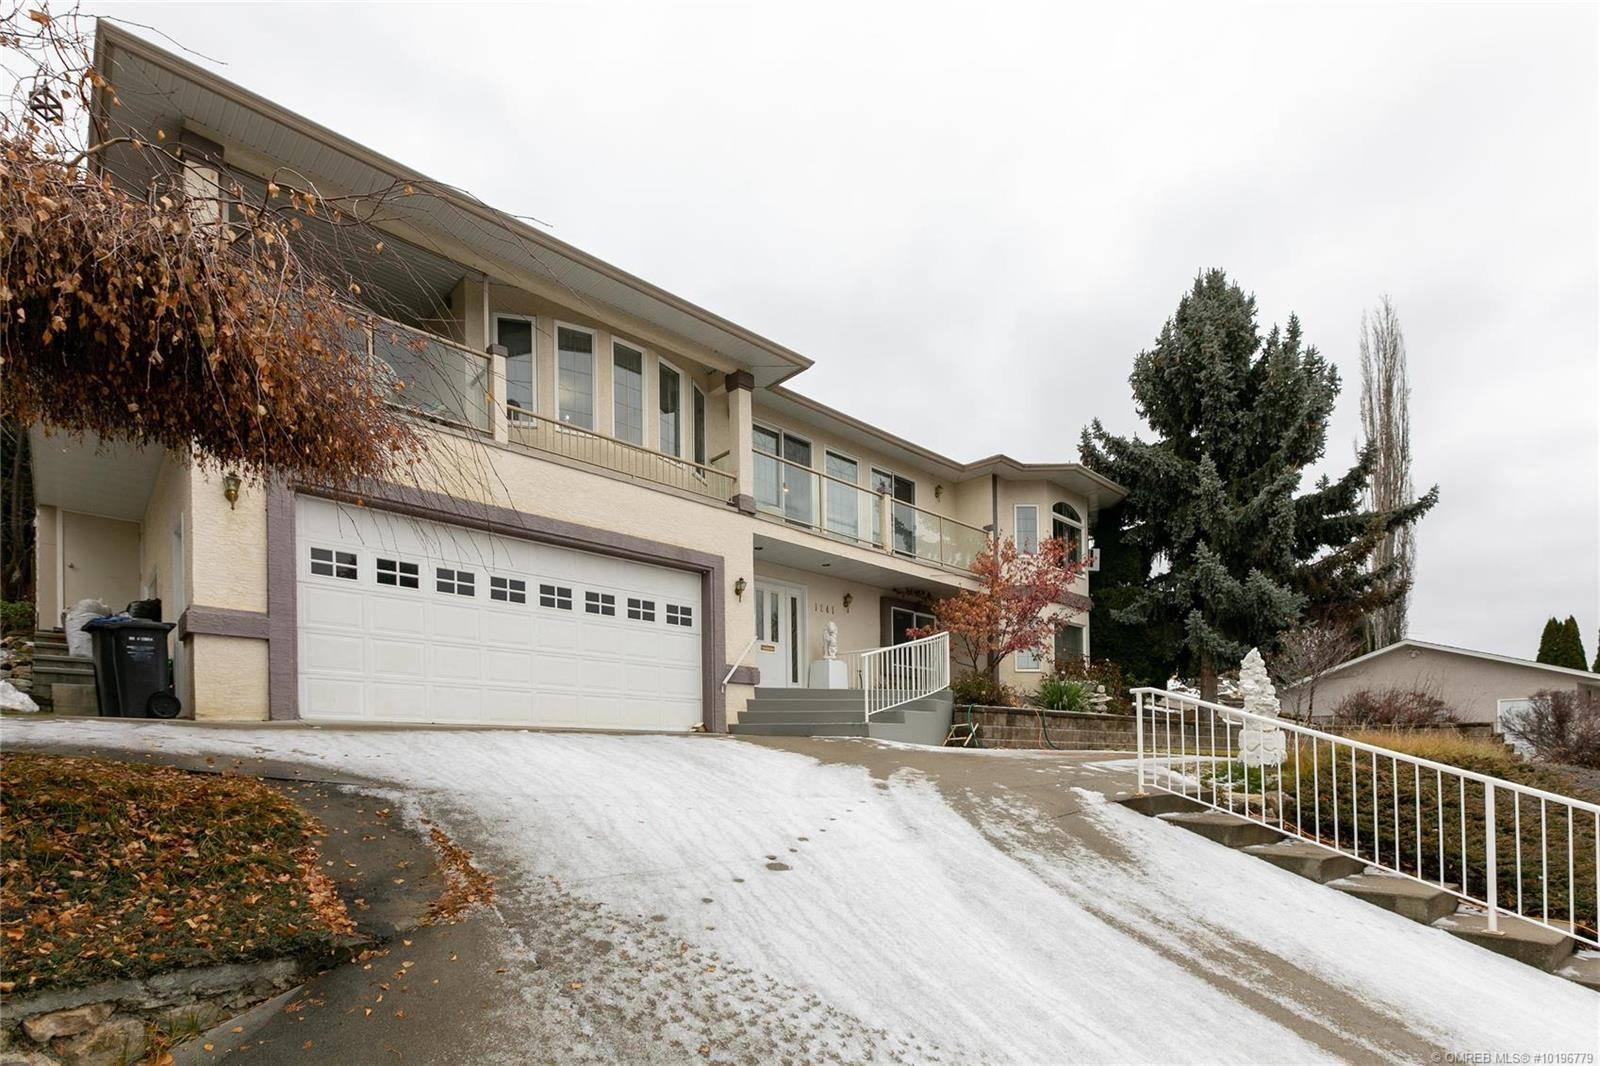 House for sale at 1241 Velrose Rd Kelowna British Columbia - MLS: 10196779